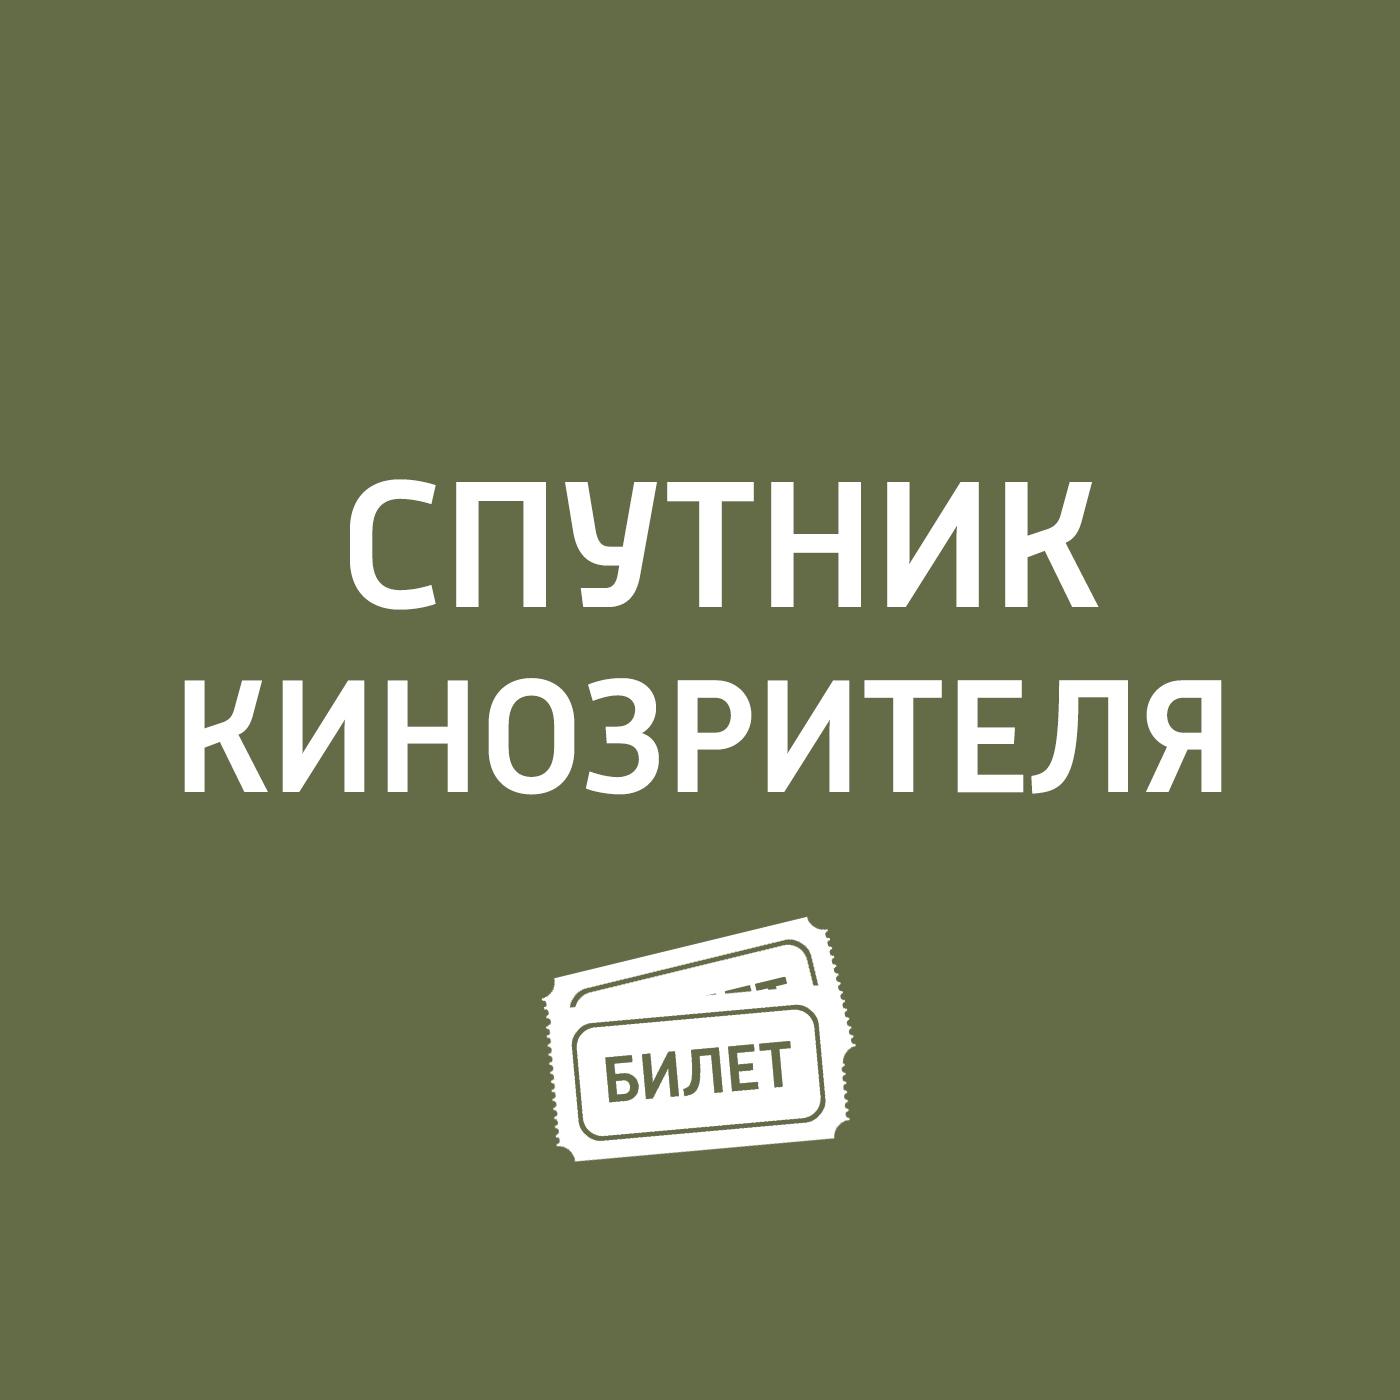 купить Антон Долин Лучшее. Харрисон Форд